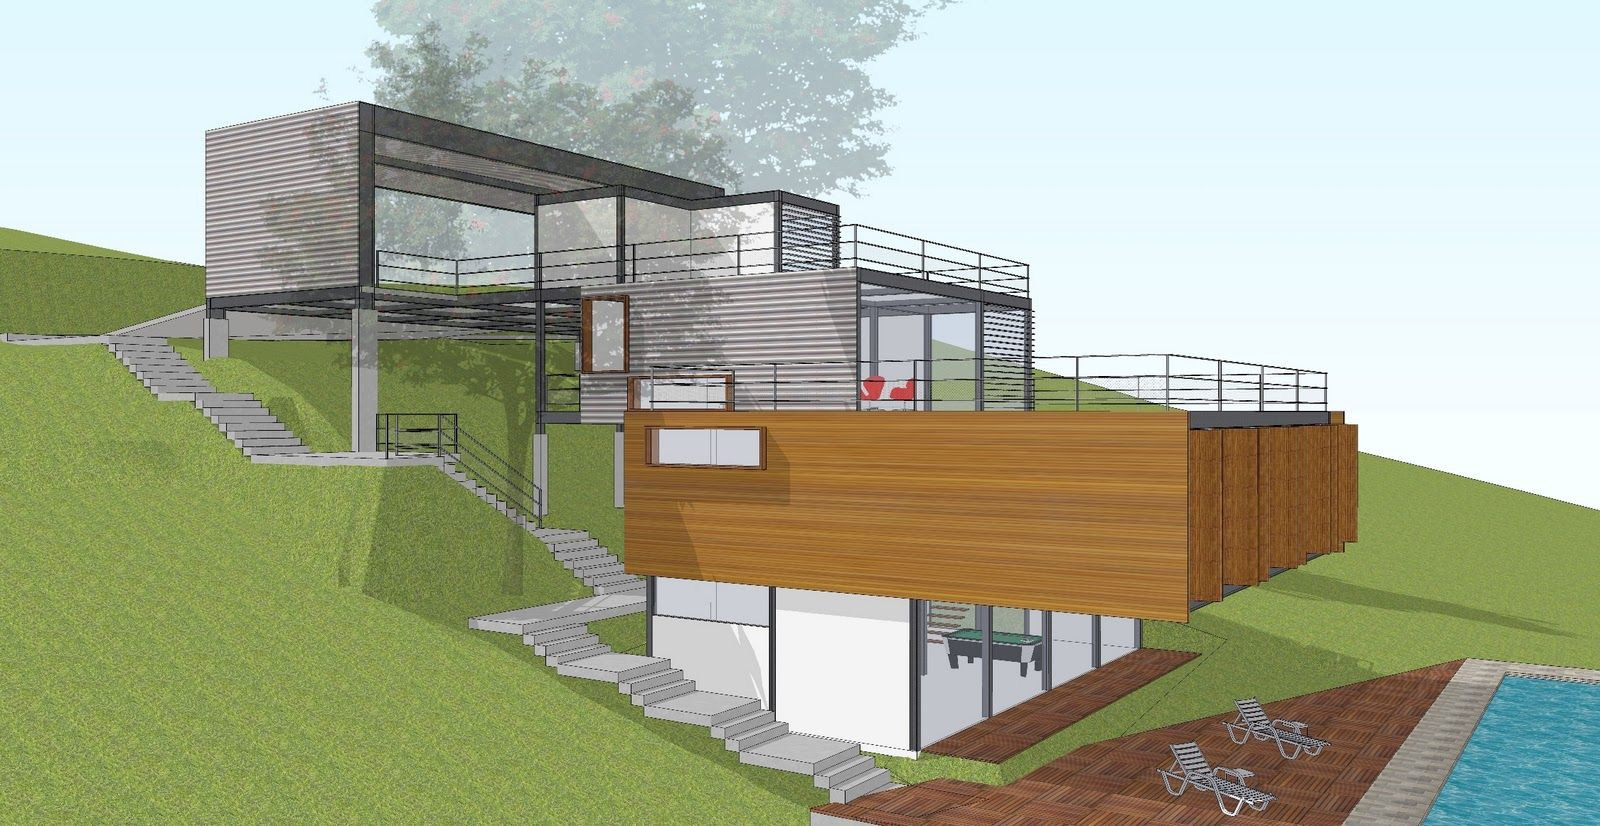 Casa terreno acidentado fachada pinterest casas casas modernas y casas campestres - Casa con terreno ...